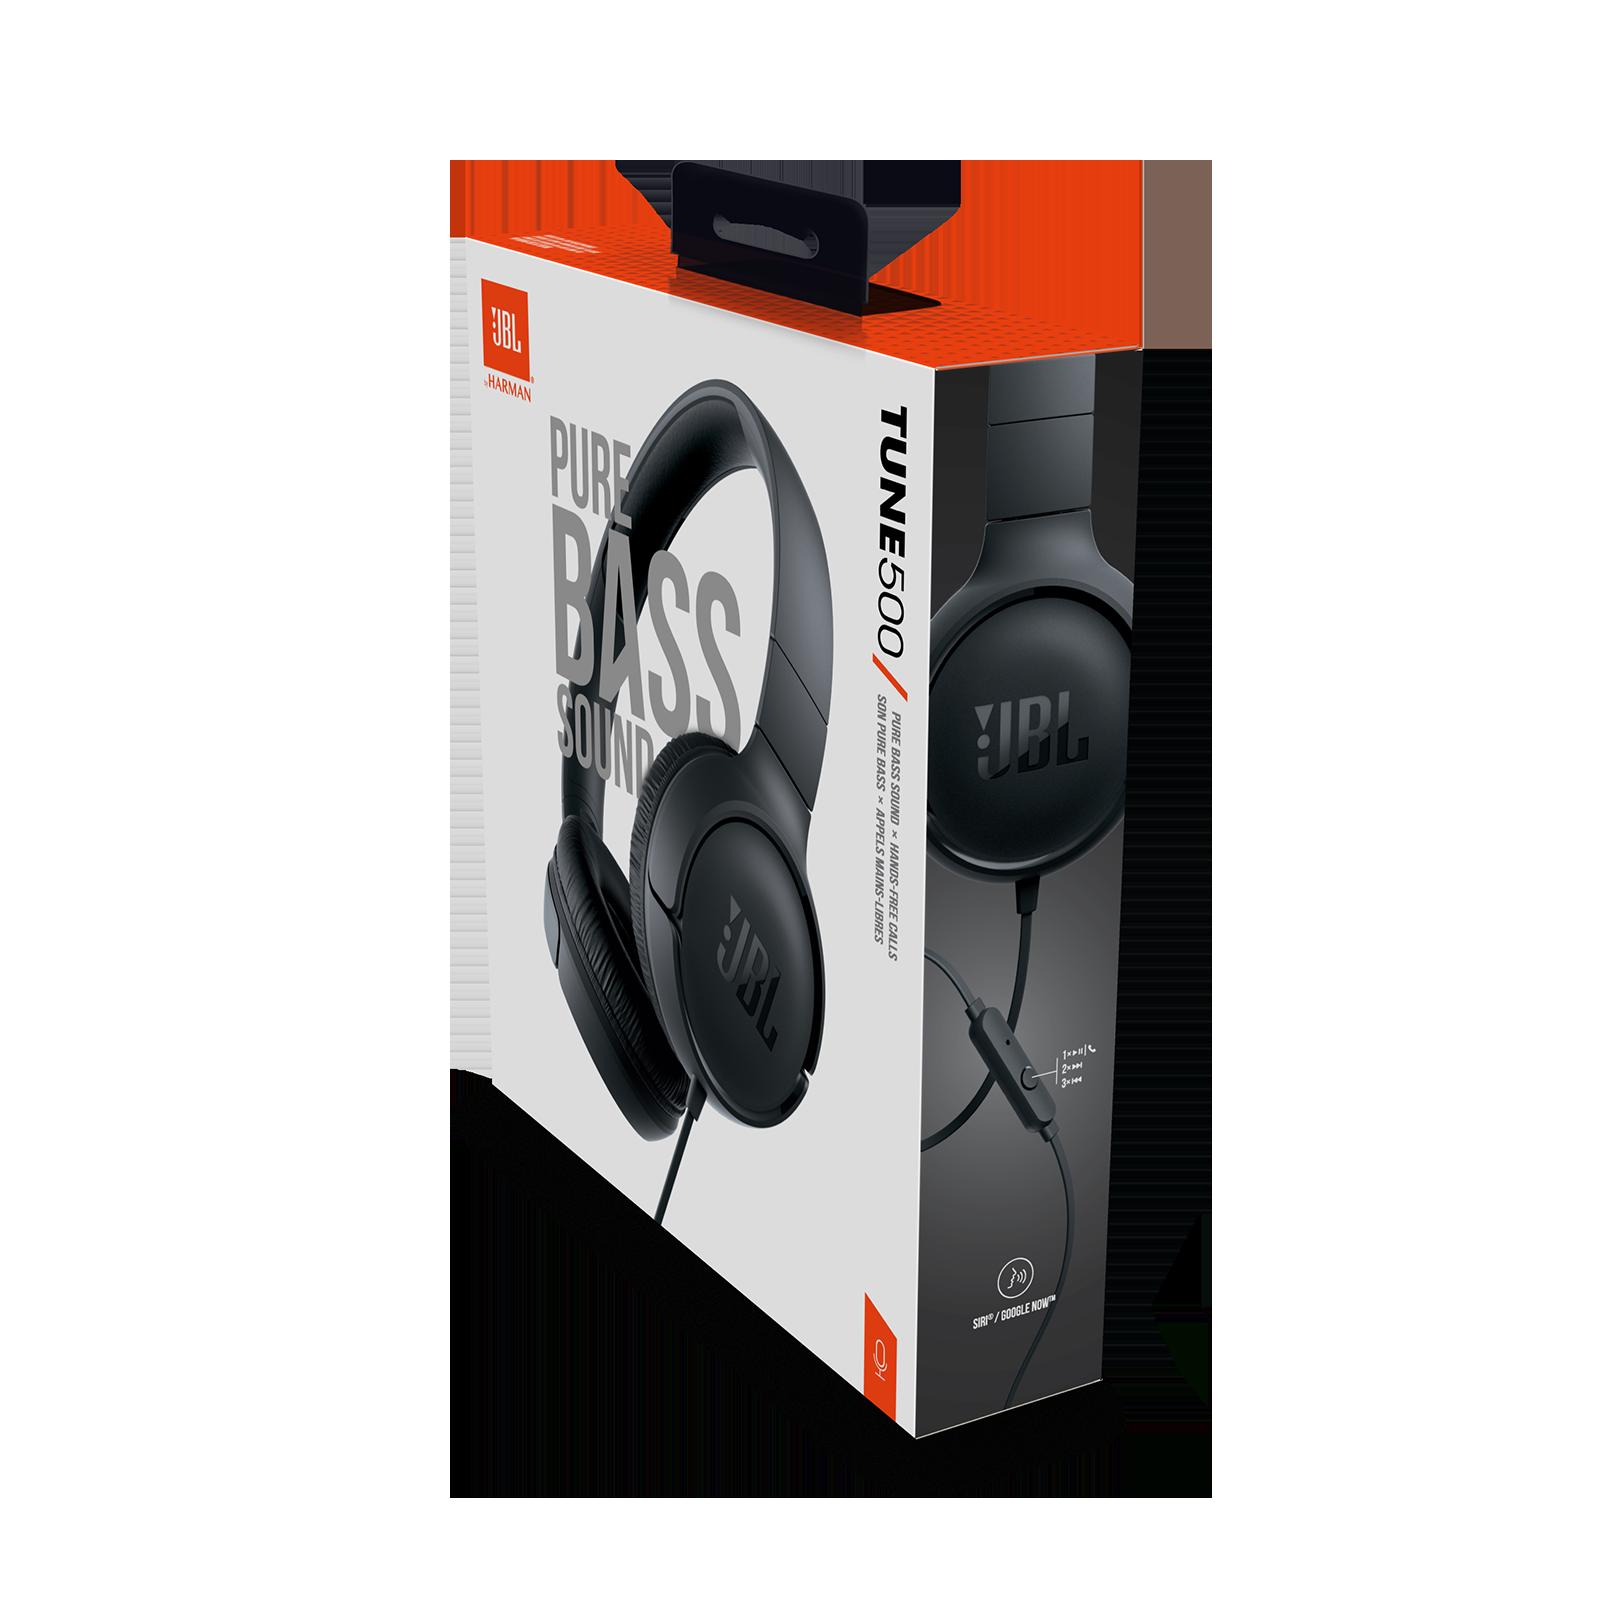 JBL TUNE 500 | Wired on ear headphones